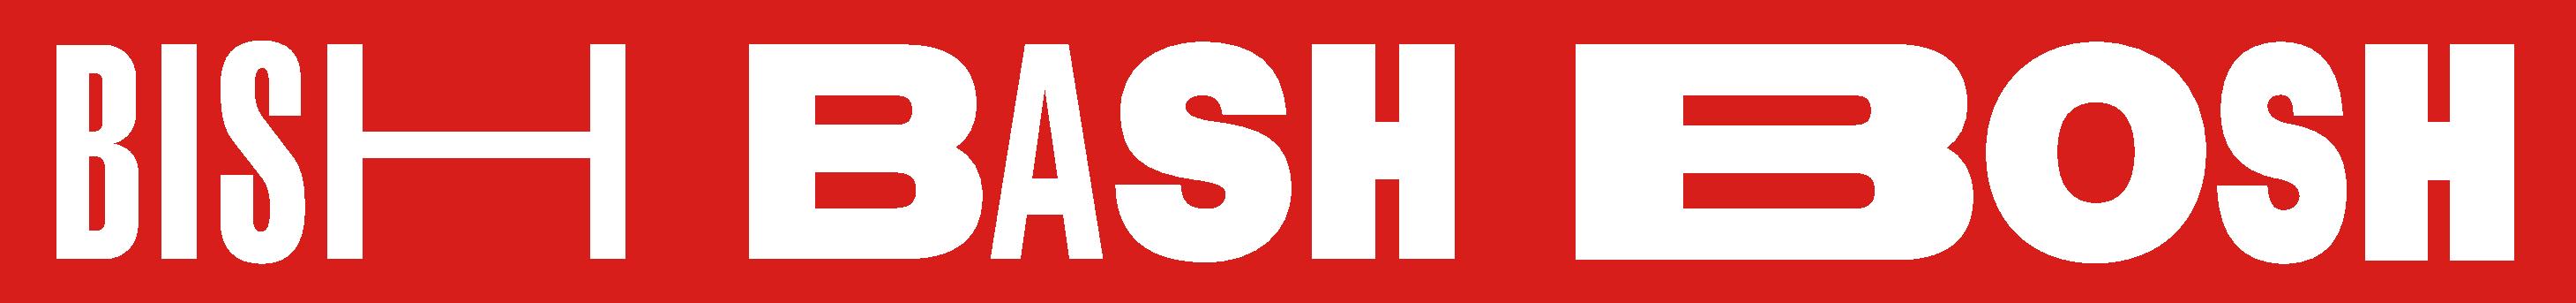 bishbashbosh